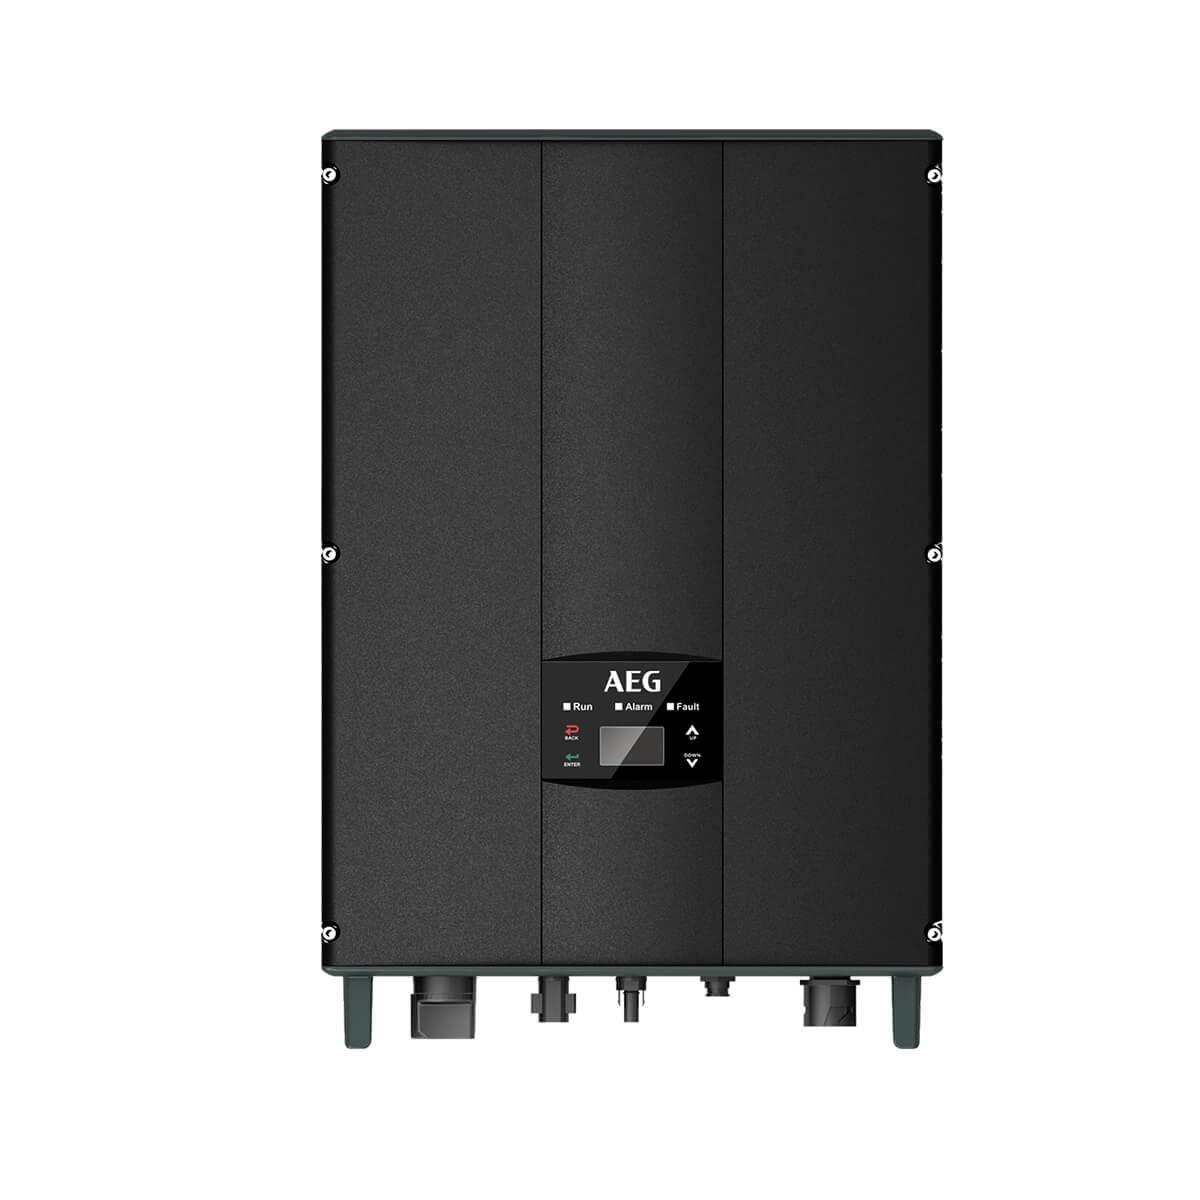 aeg 5kW inverter, aeg as-ic01 5kW inverter, aeg as-ic01-5000 inverter, aeg as-ic01-5000, aeg as-ic01 5kW, AEG 5KW